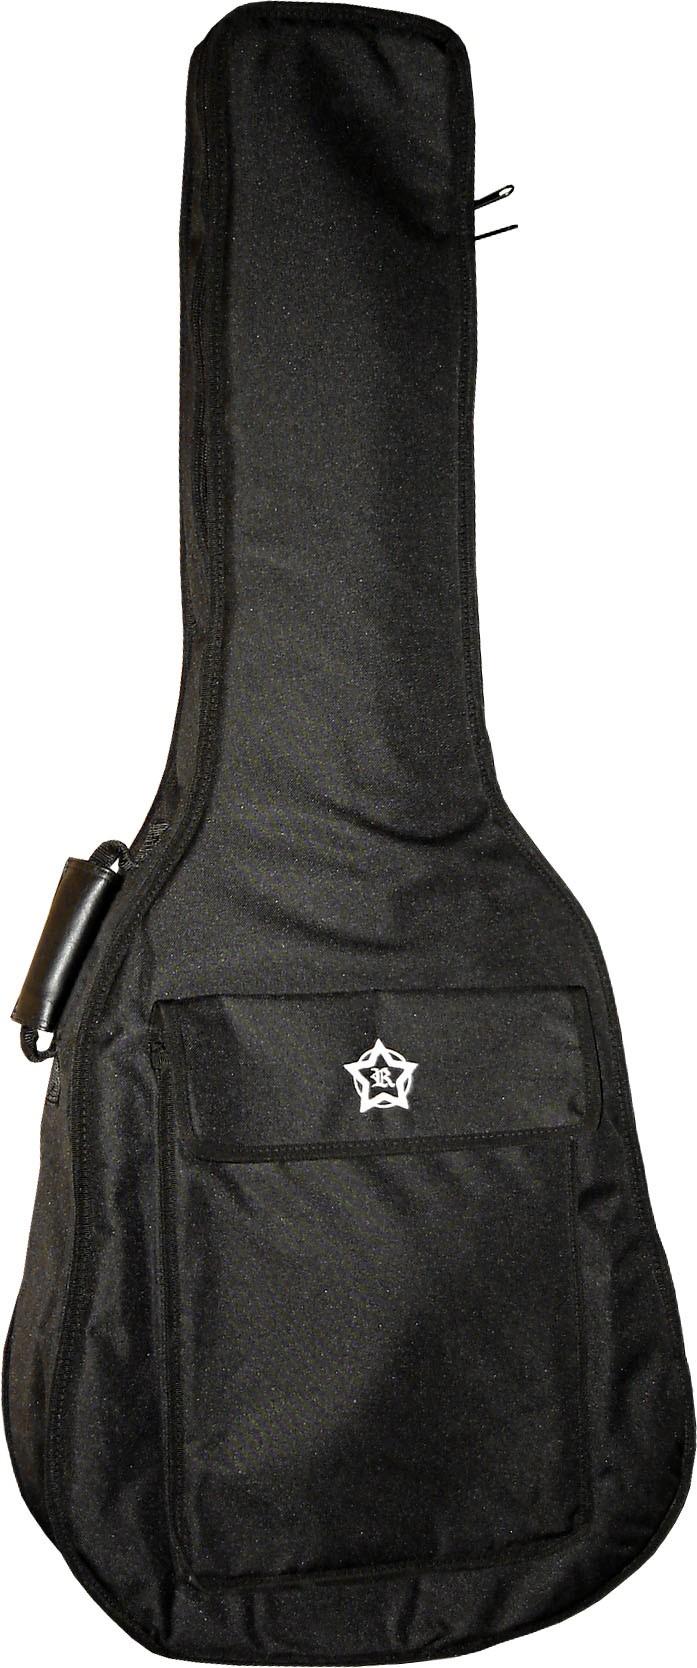 Rosetti Acoustic Guitar Gigbag - Black